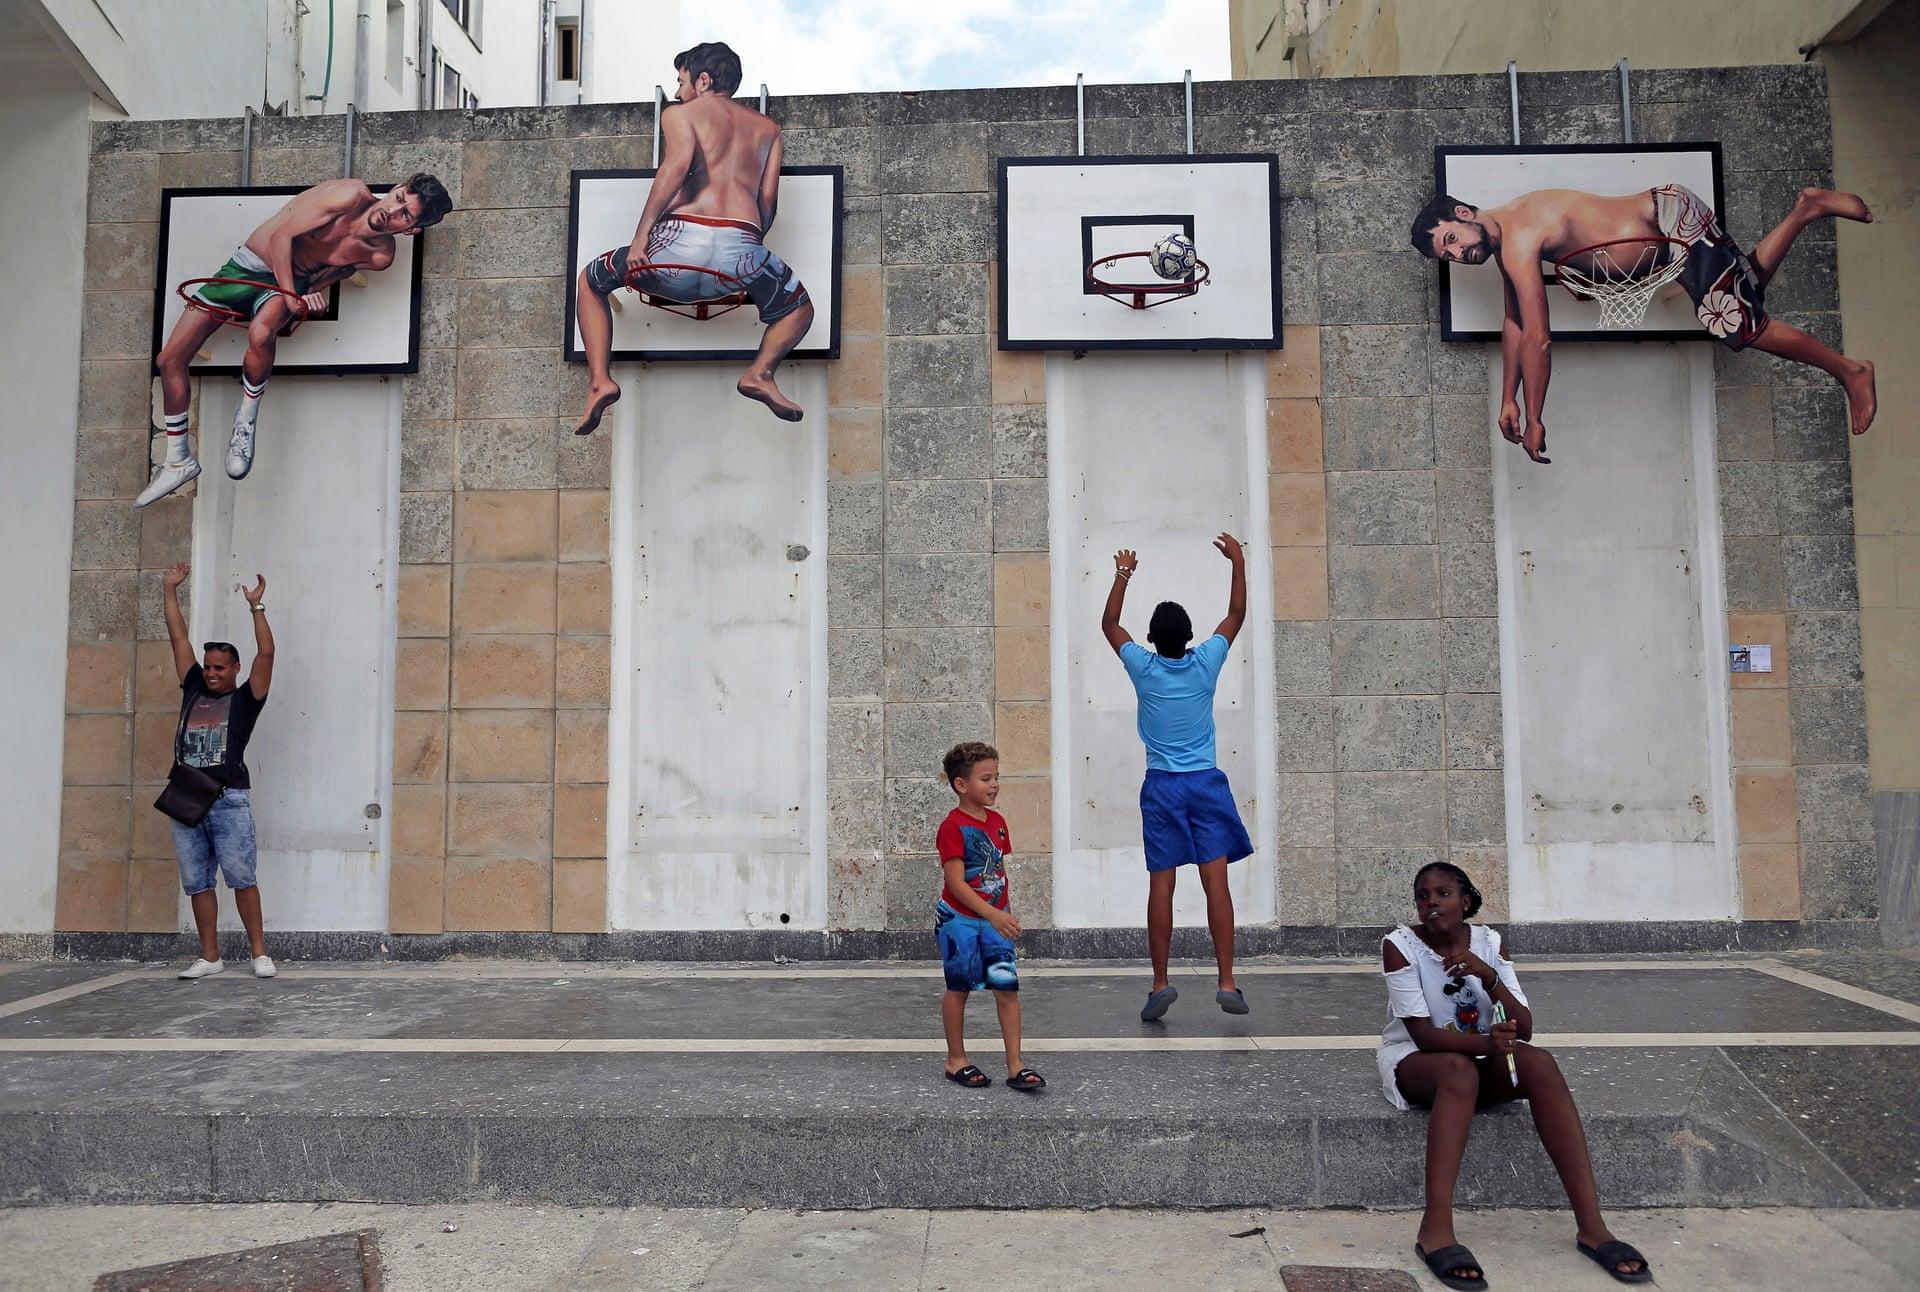 Fernando Medina/Reuters/Scanpix